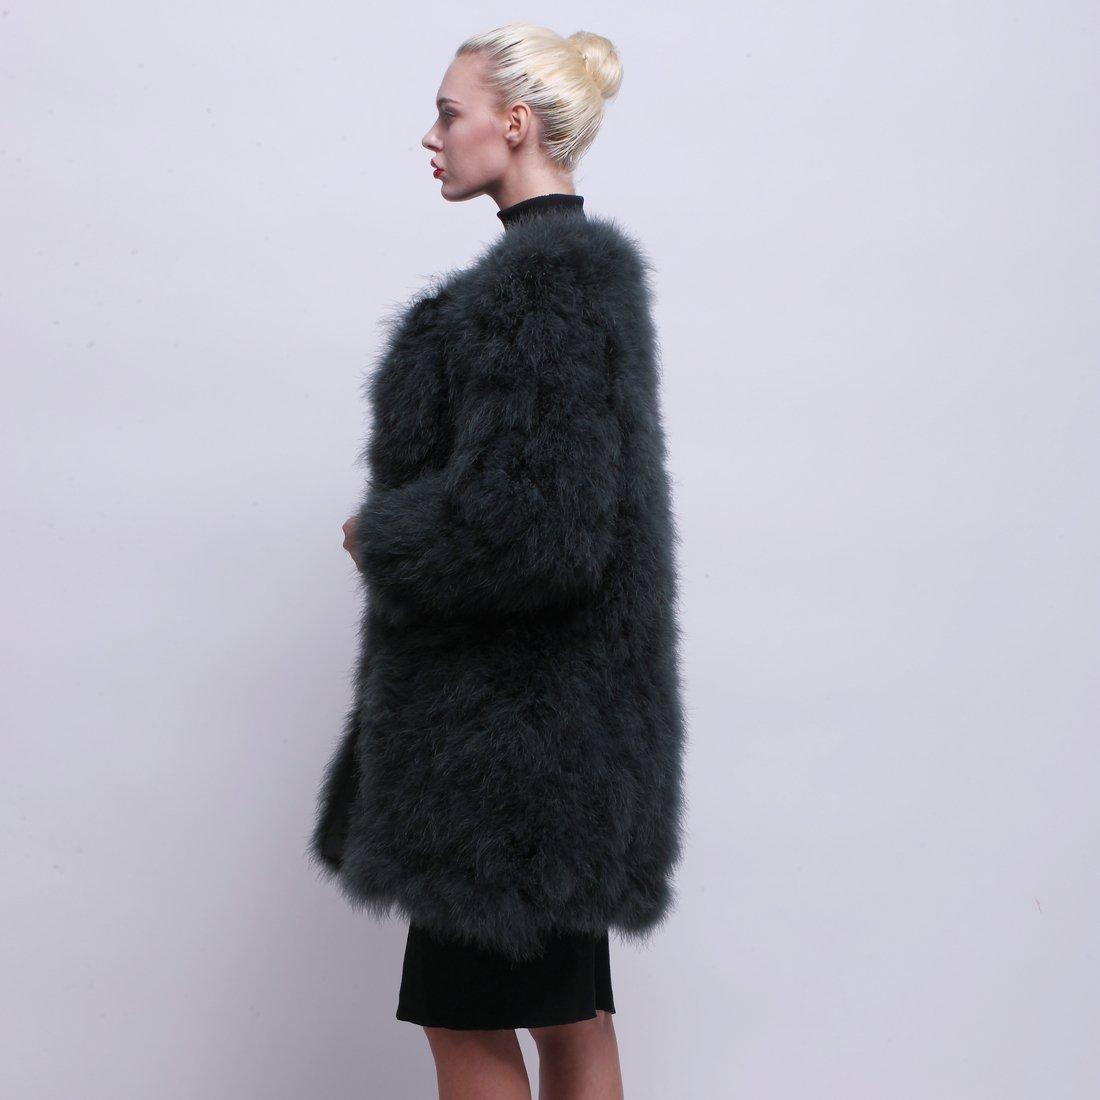 URSFUR Women Winter Jacket Real Ostrich Feather Fur Coat Opal Green XL by URSFUR (Image #4)